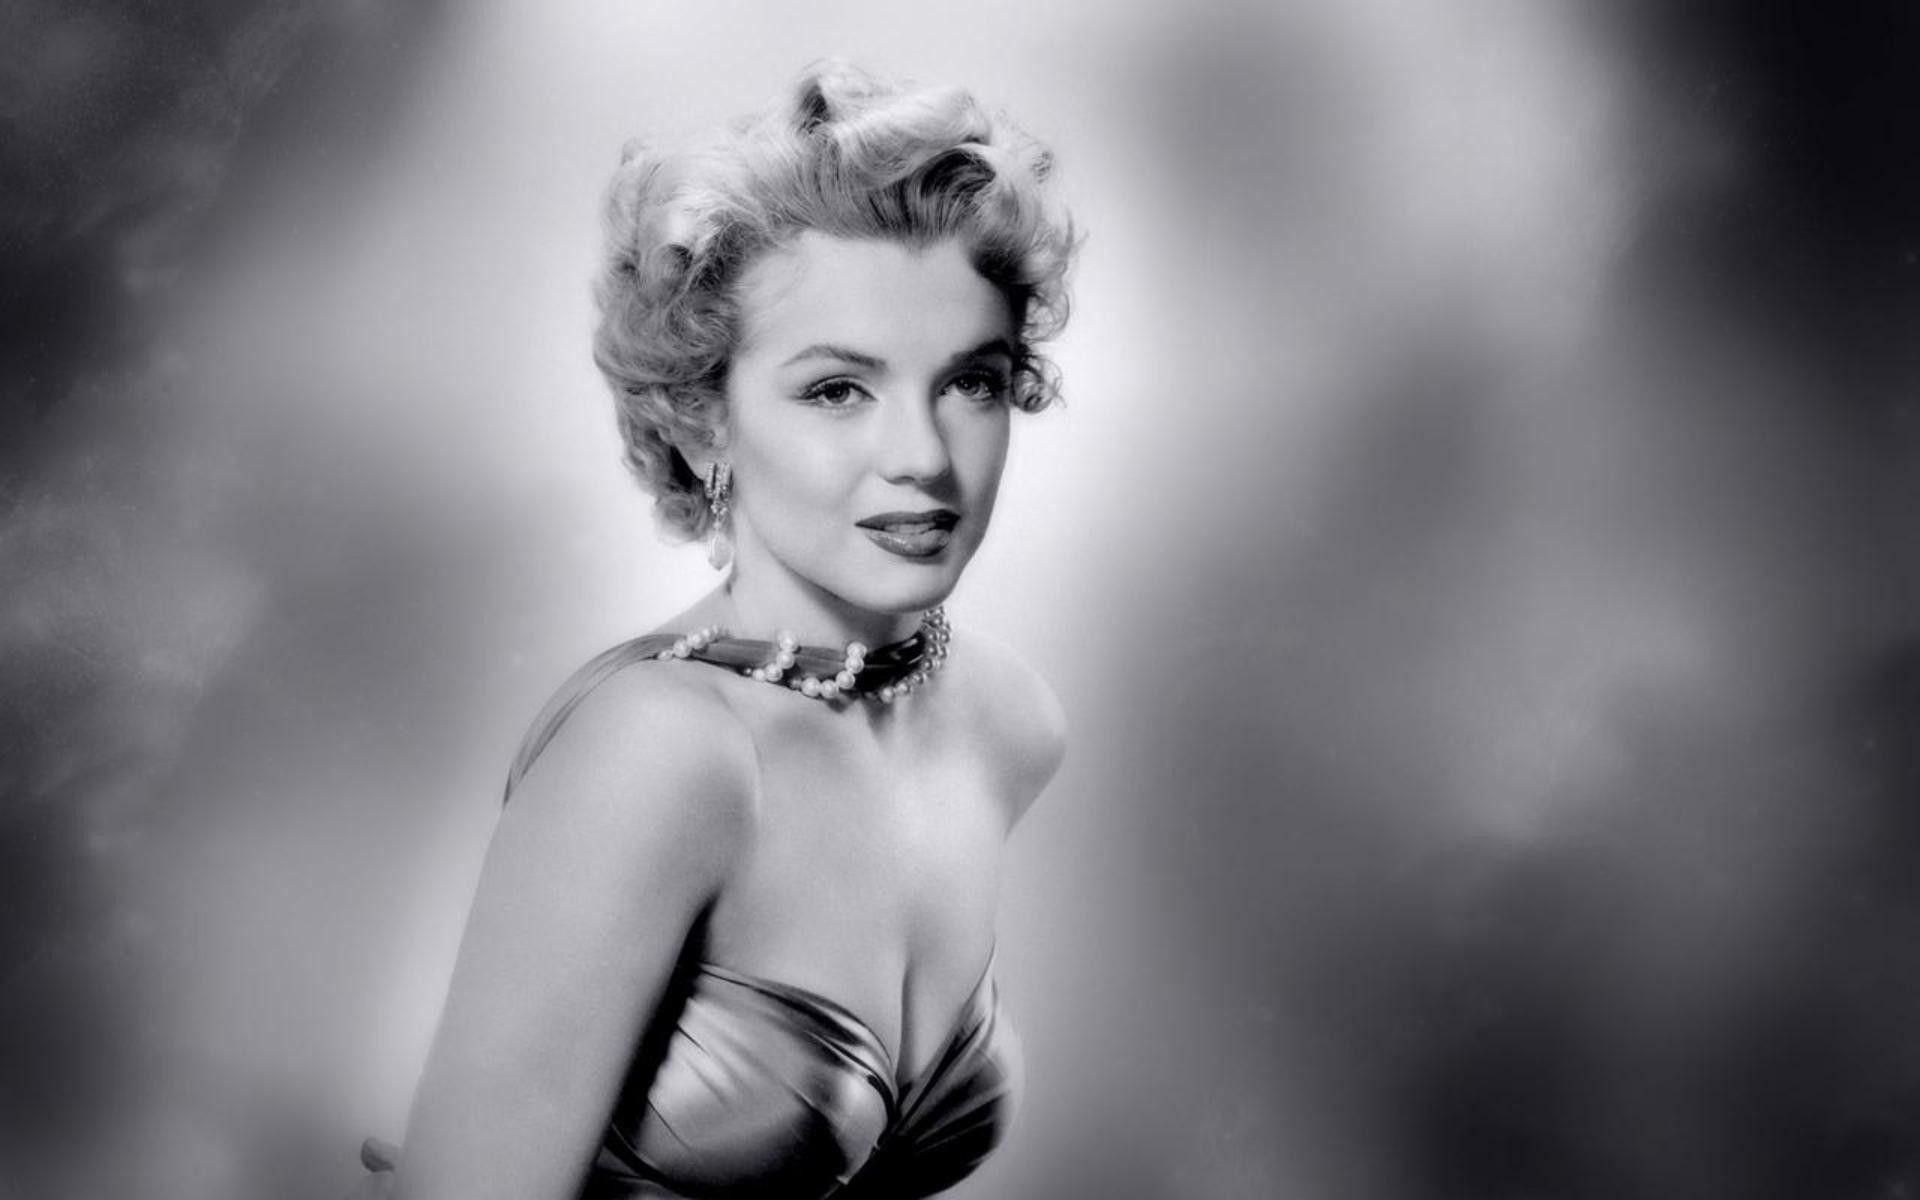 Top Marilyn Monroe Wallpaper Form Images for Pinterest